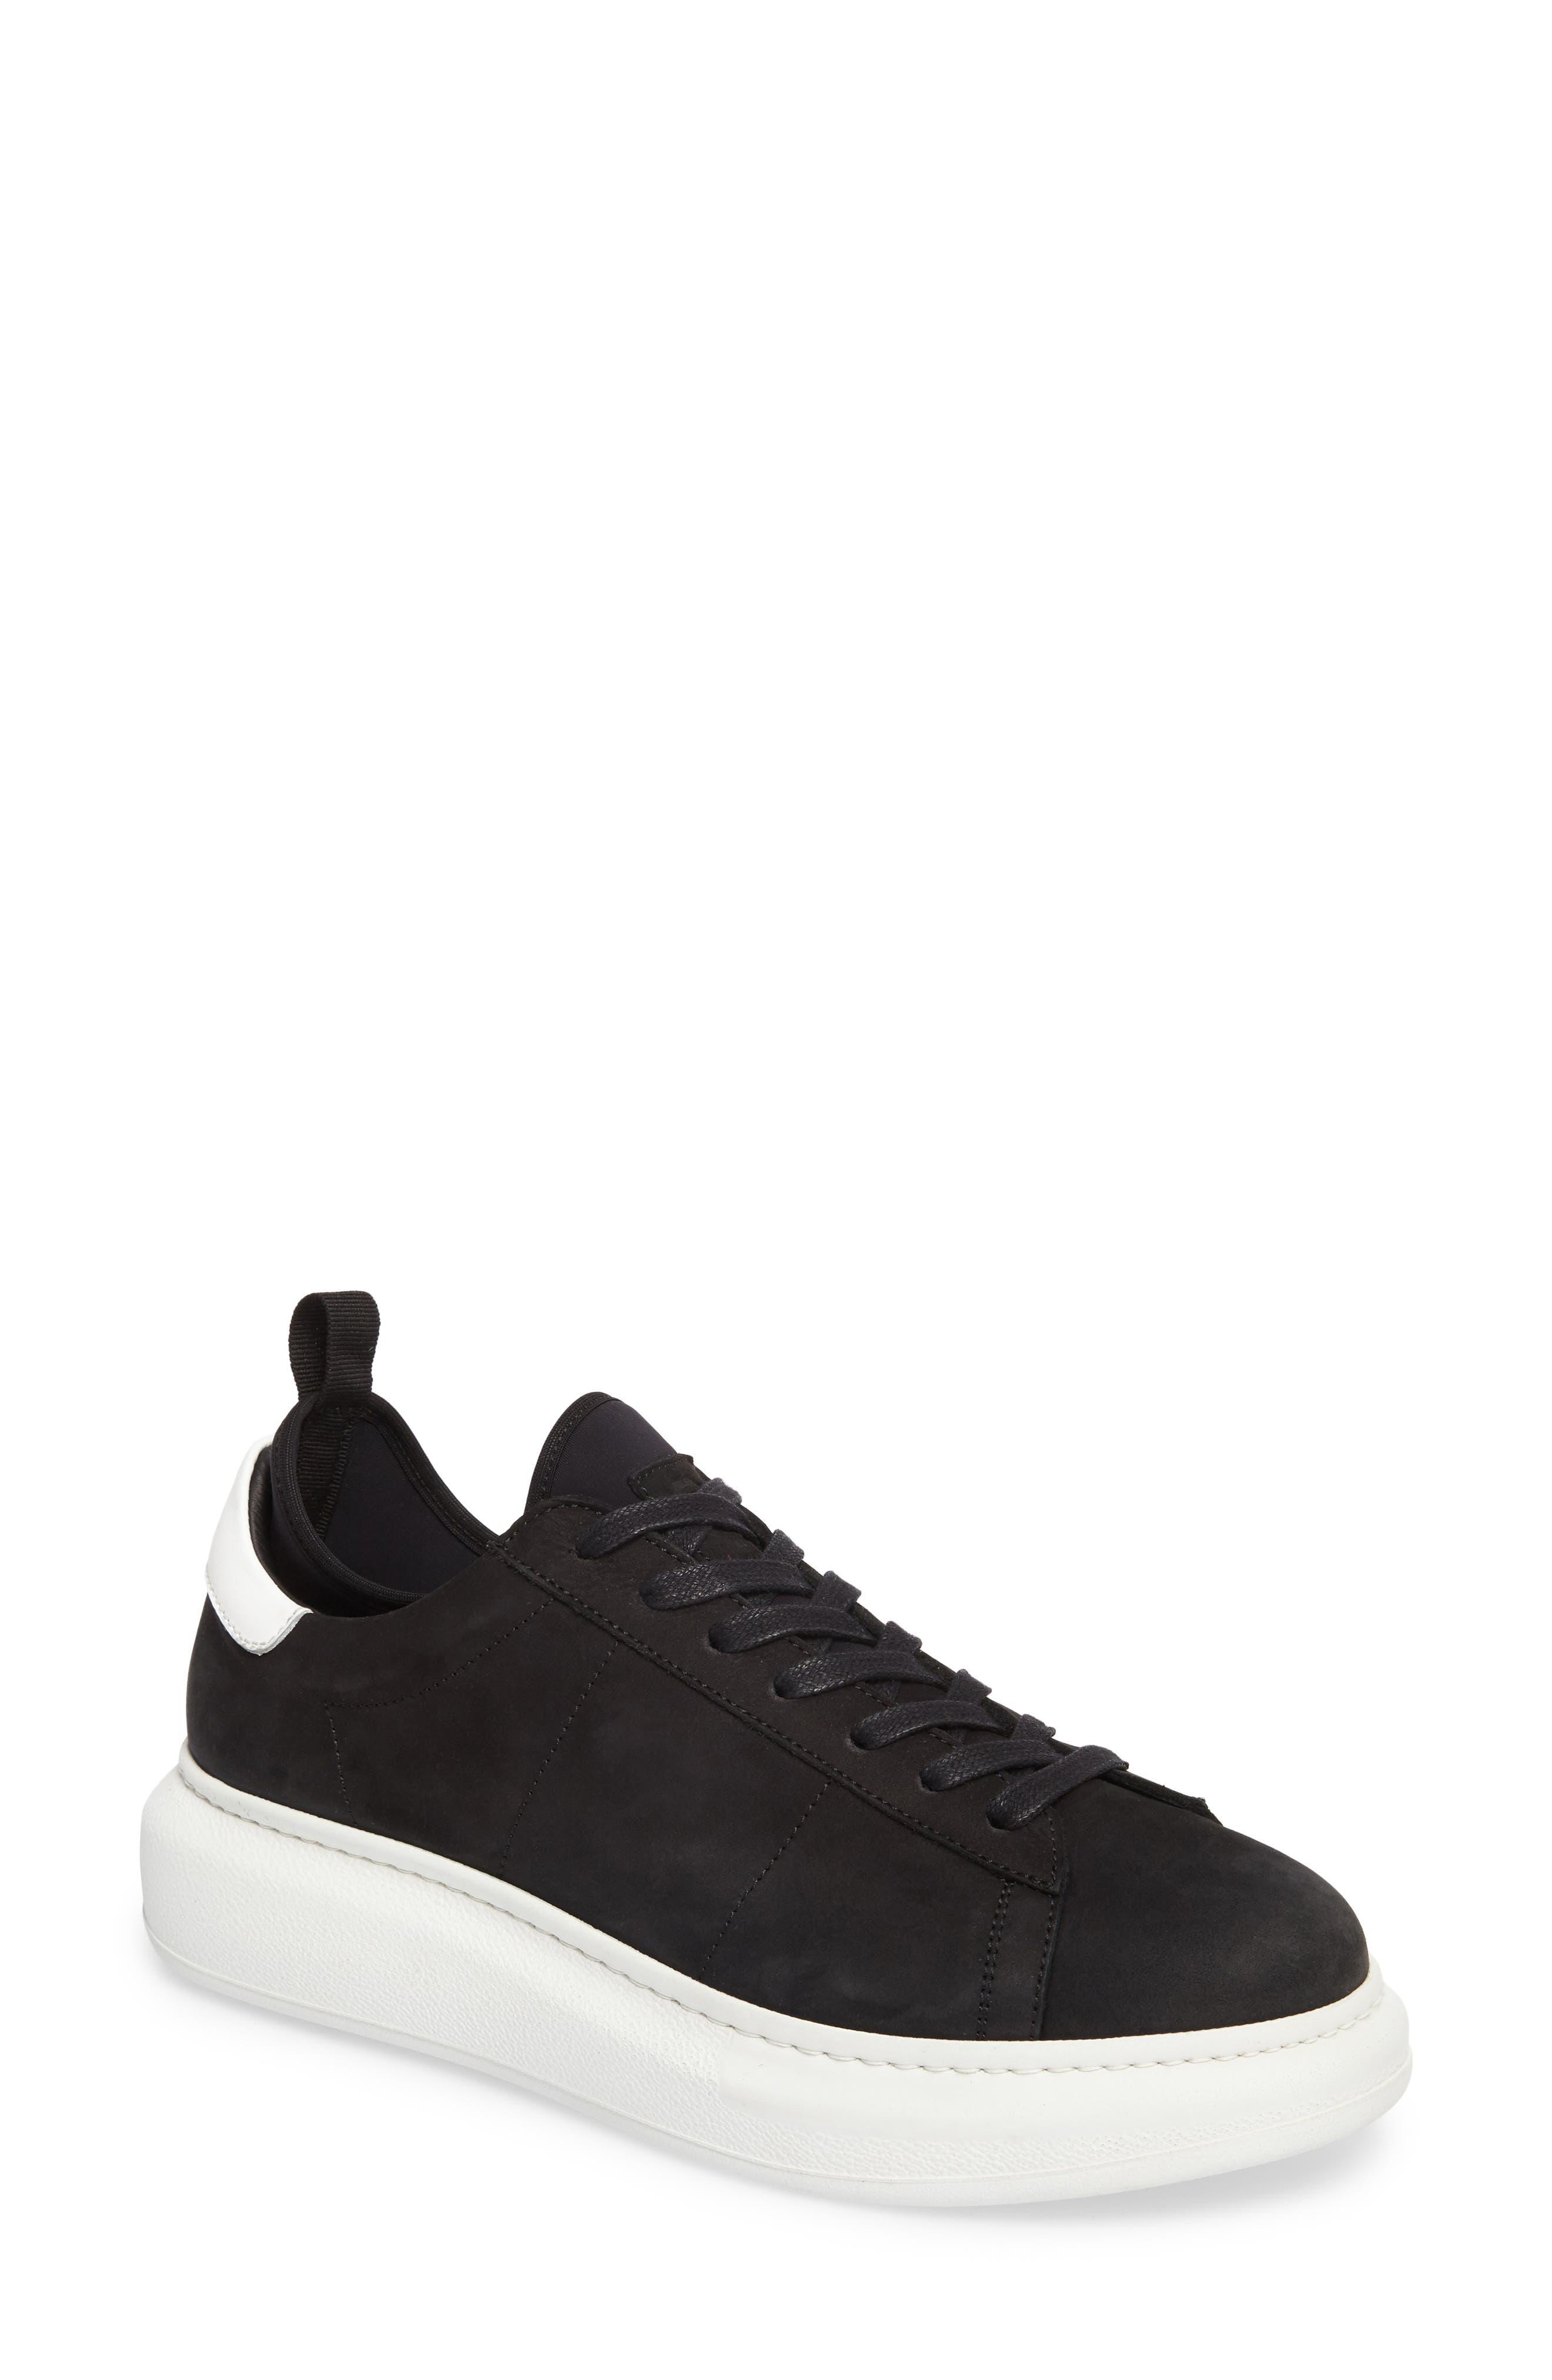 Alta Low Top Sneaker,                         Main,                         color, BLACK NUBUCK LEATHER